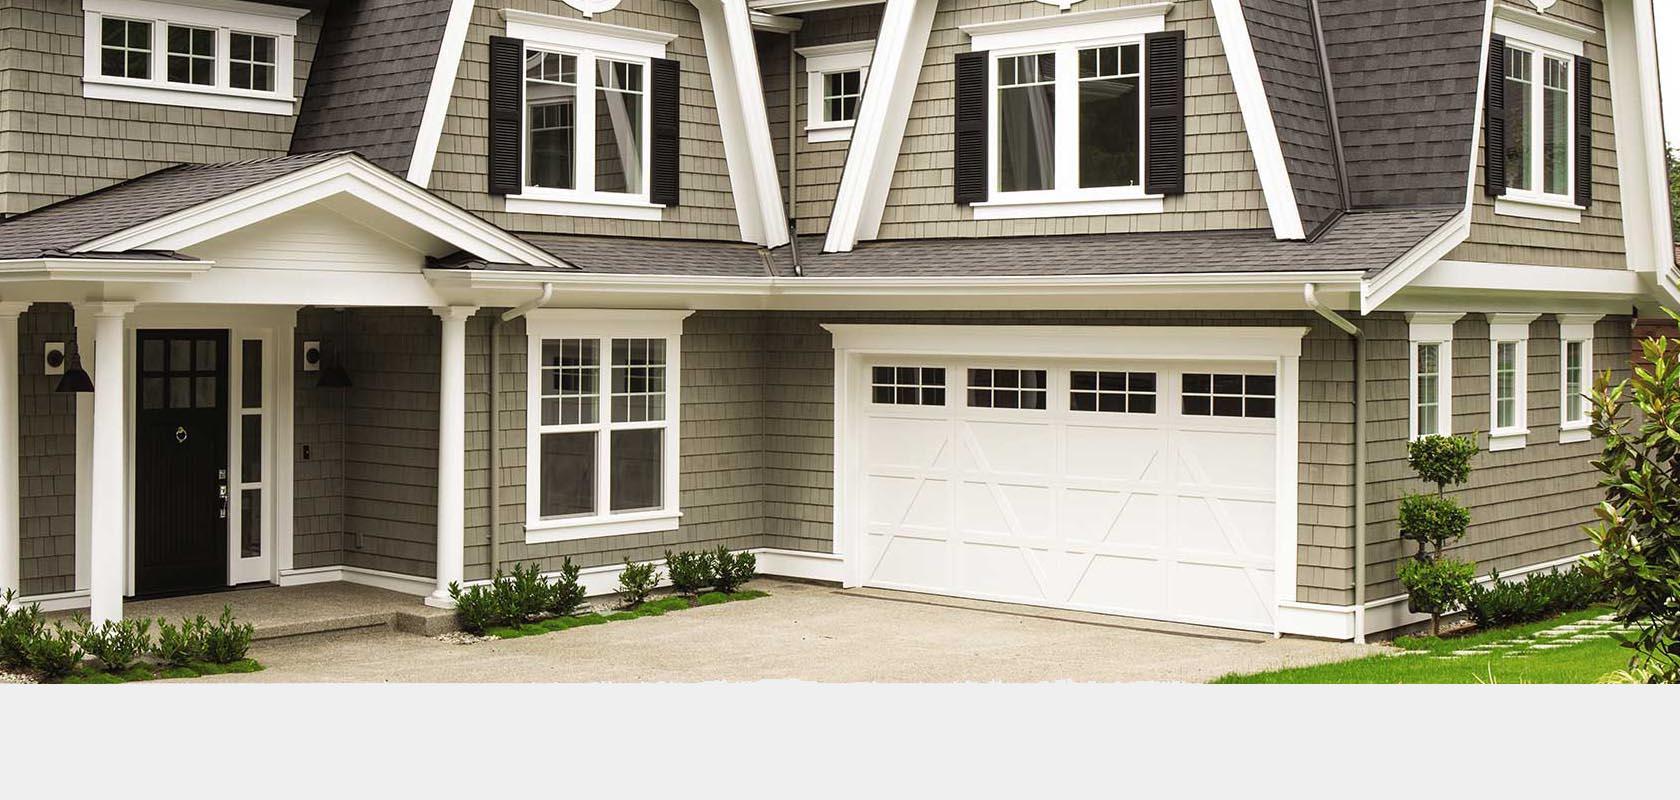 Garage Door Repair Tacoma Wa Choice Image Door Design For Home